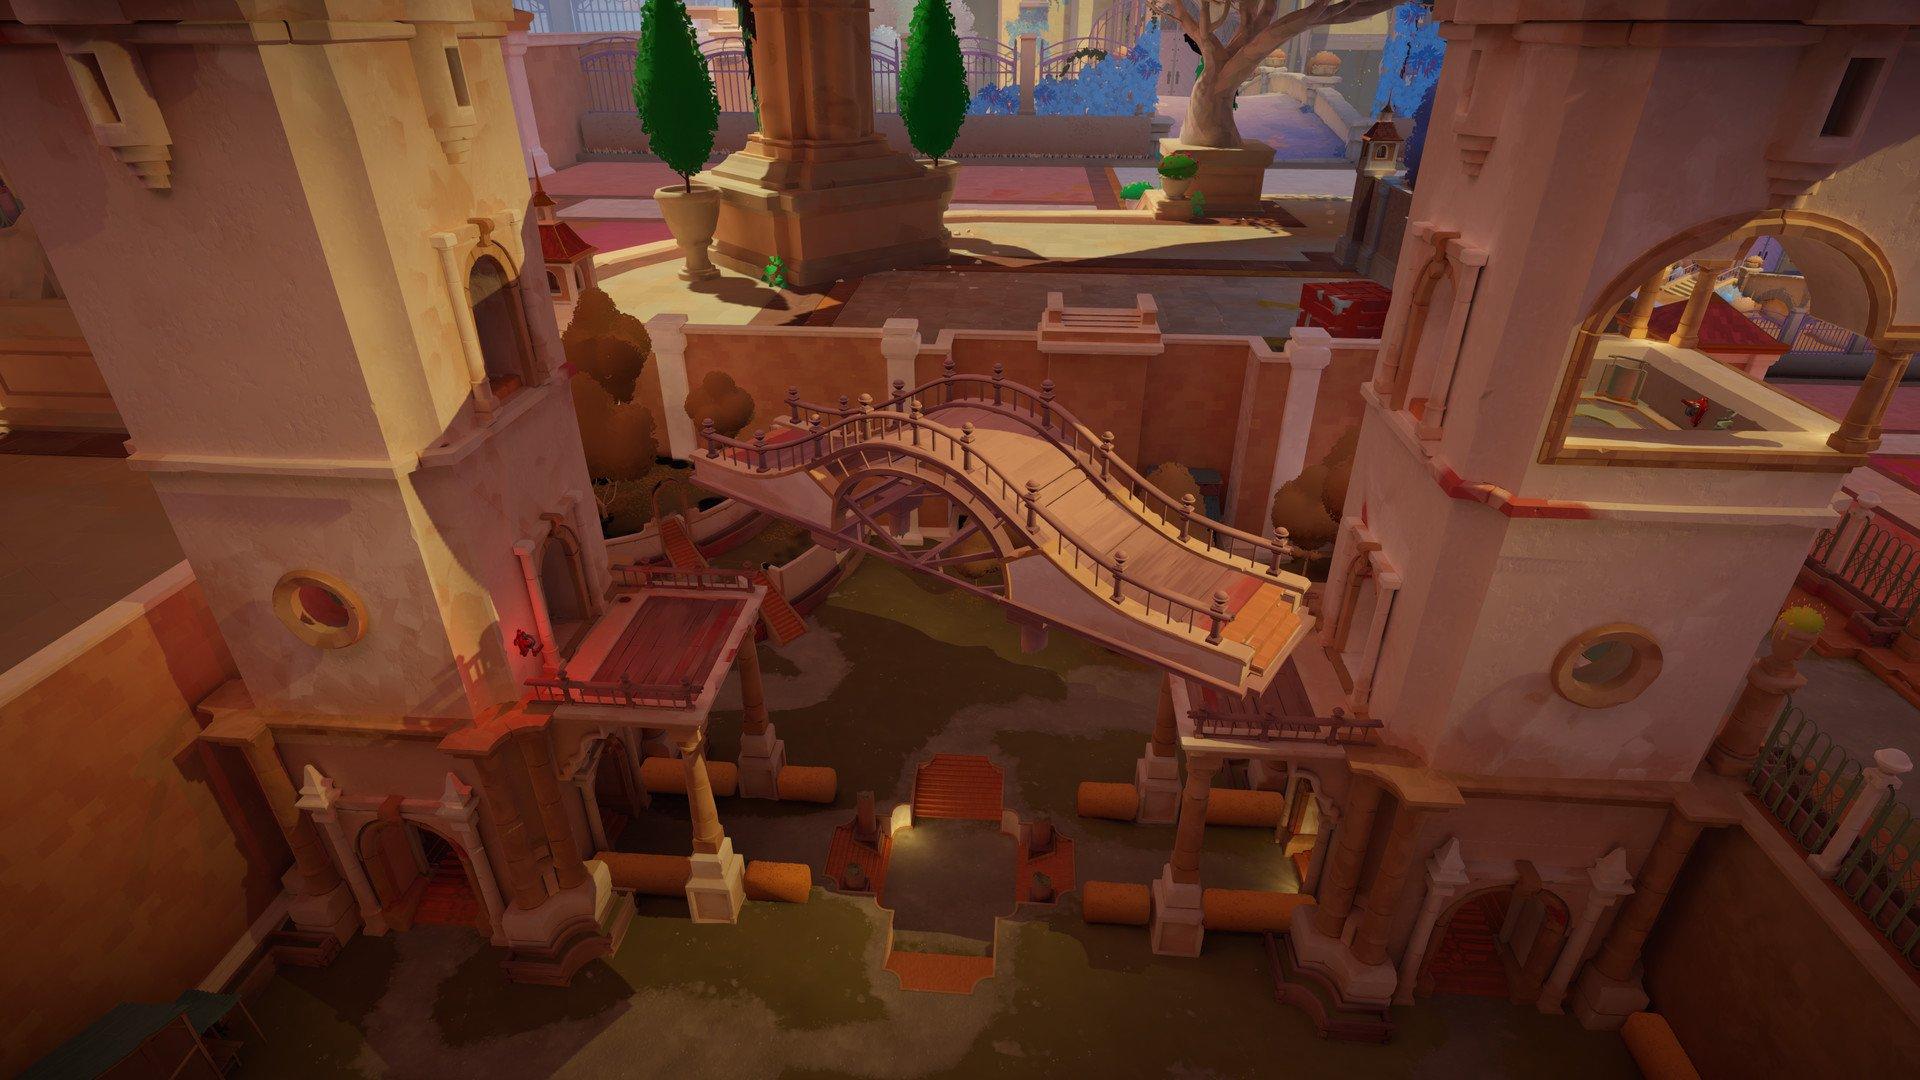 Maquette annapurna interactive new game PC